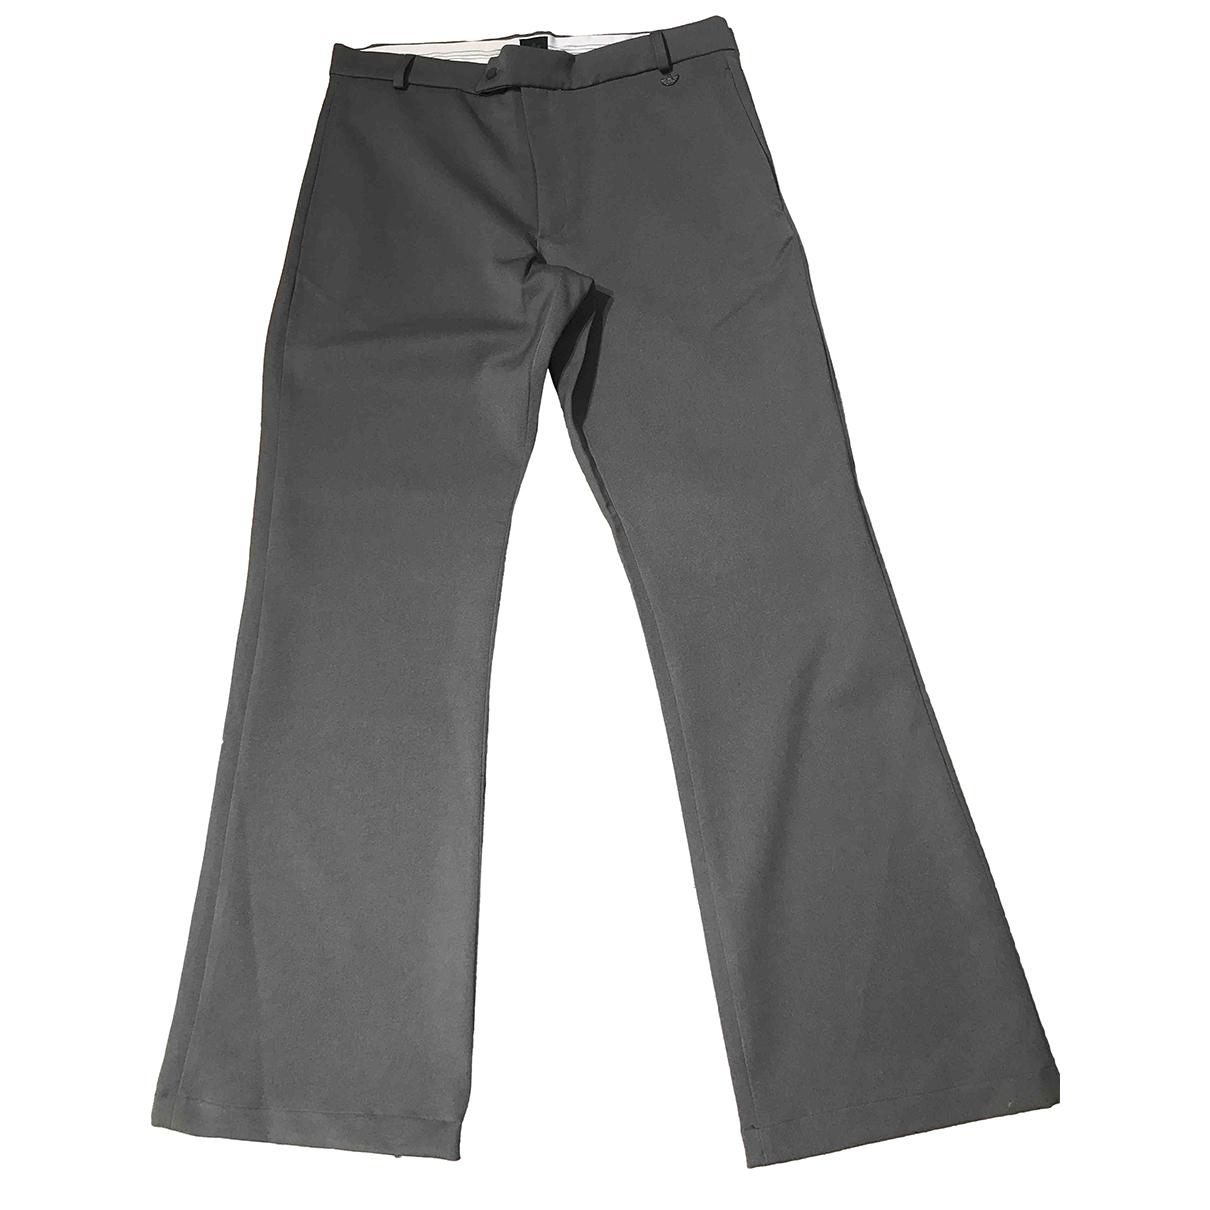 Pantalones en Poliester Gris Adidas